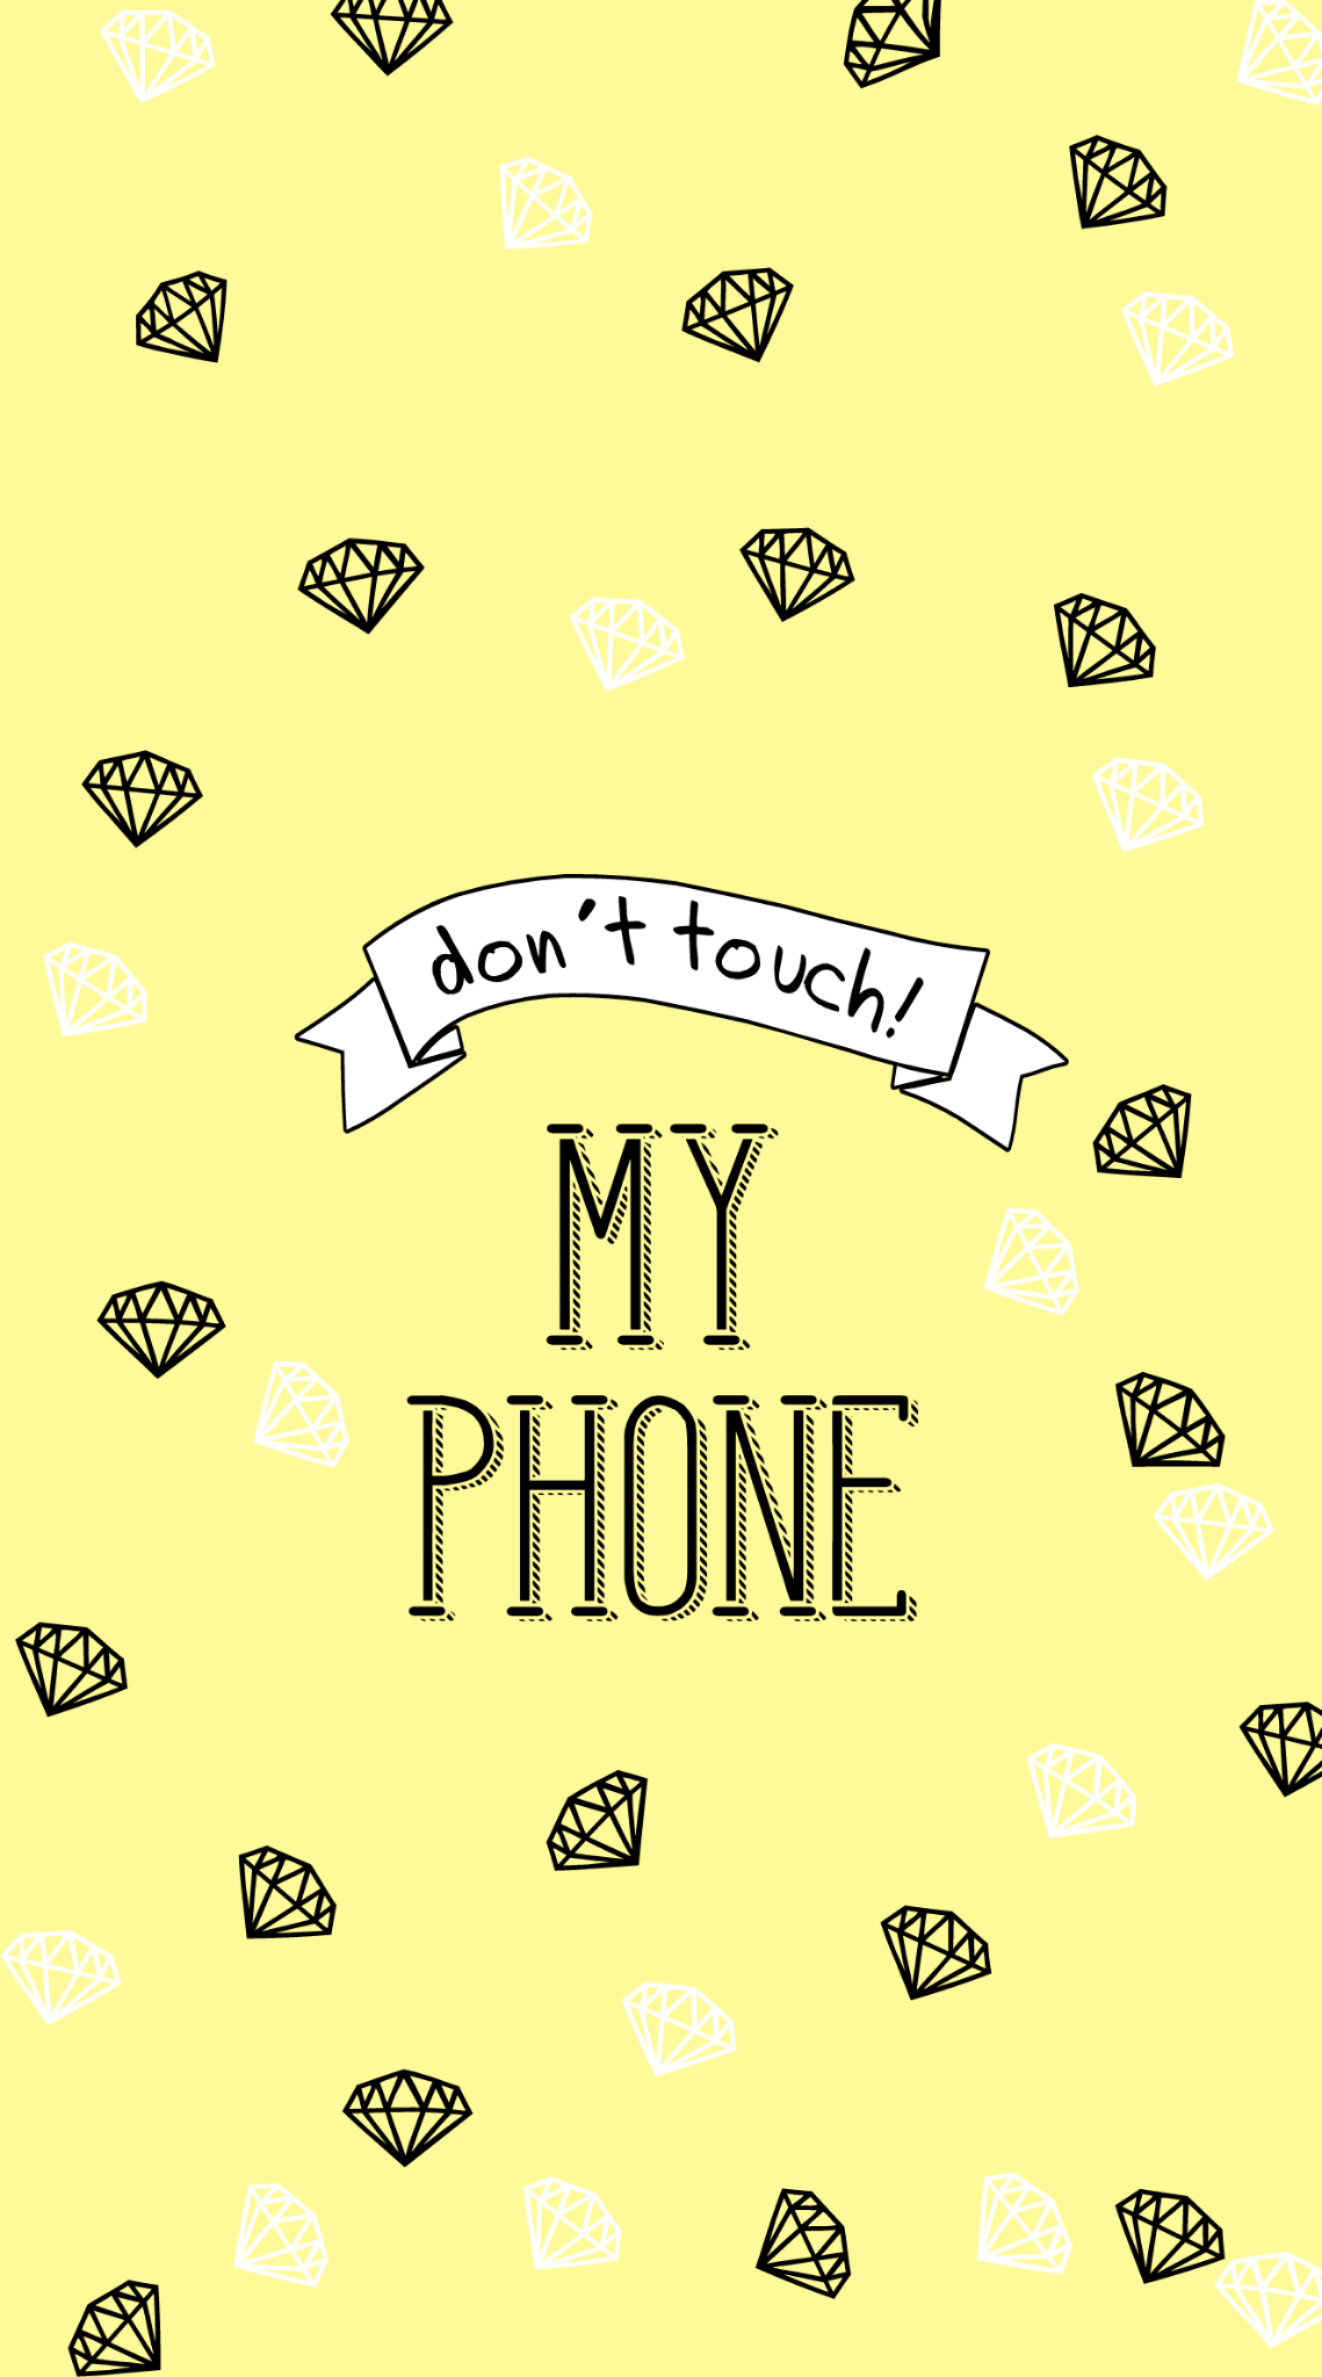 Wallpaper Phone Freetoedit Wallpaper Wallpaperedit Wallpaperphone Yellow Diamonds Dontto Dont Touch My Phone Wallpapers Wall Paper Phone Phone Wallpaper